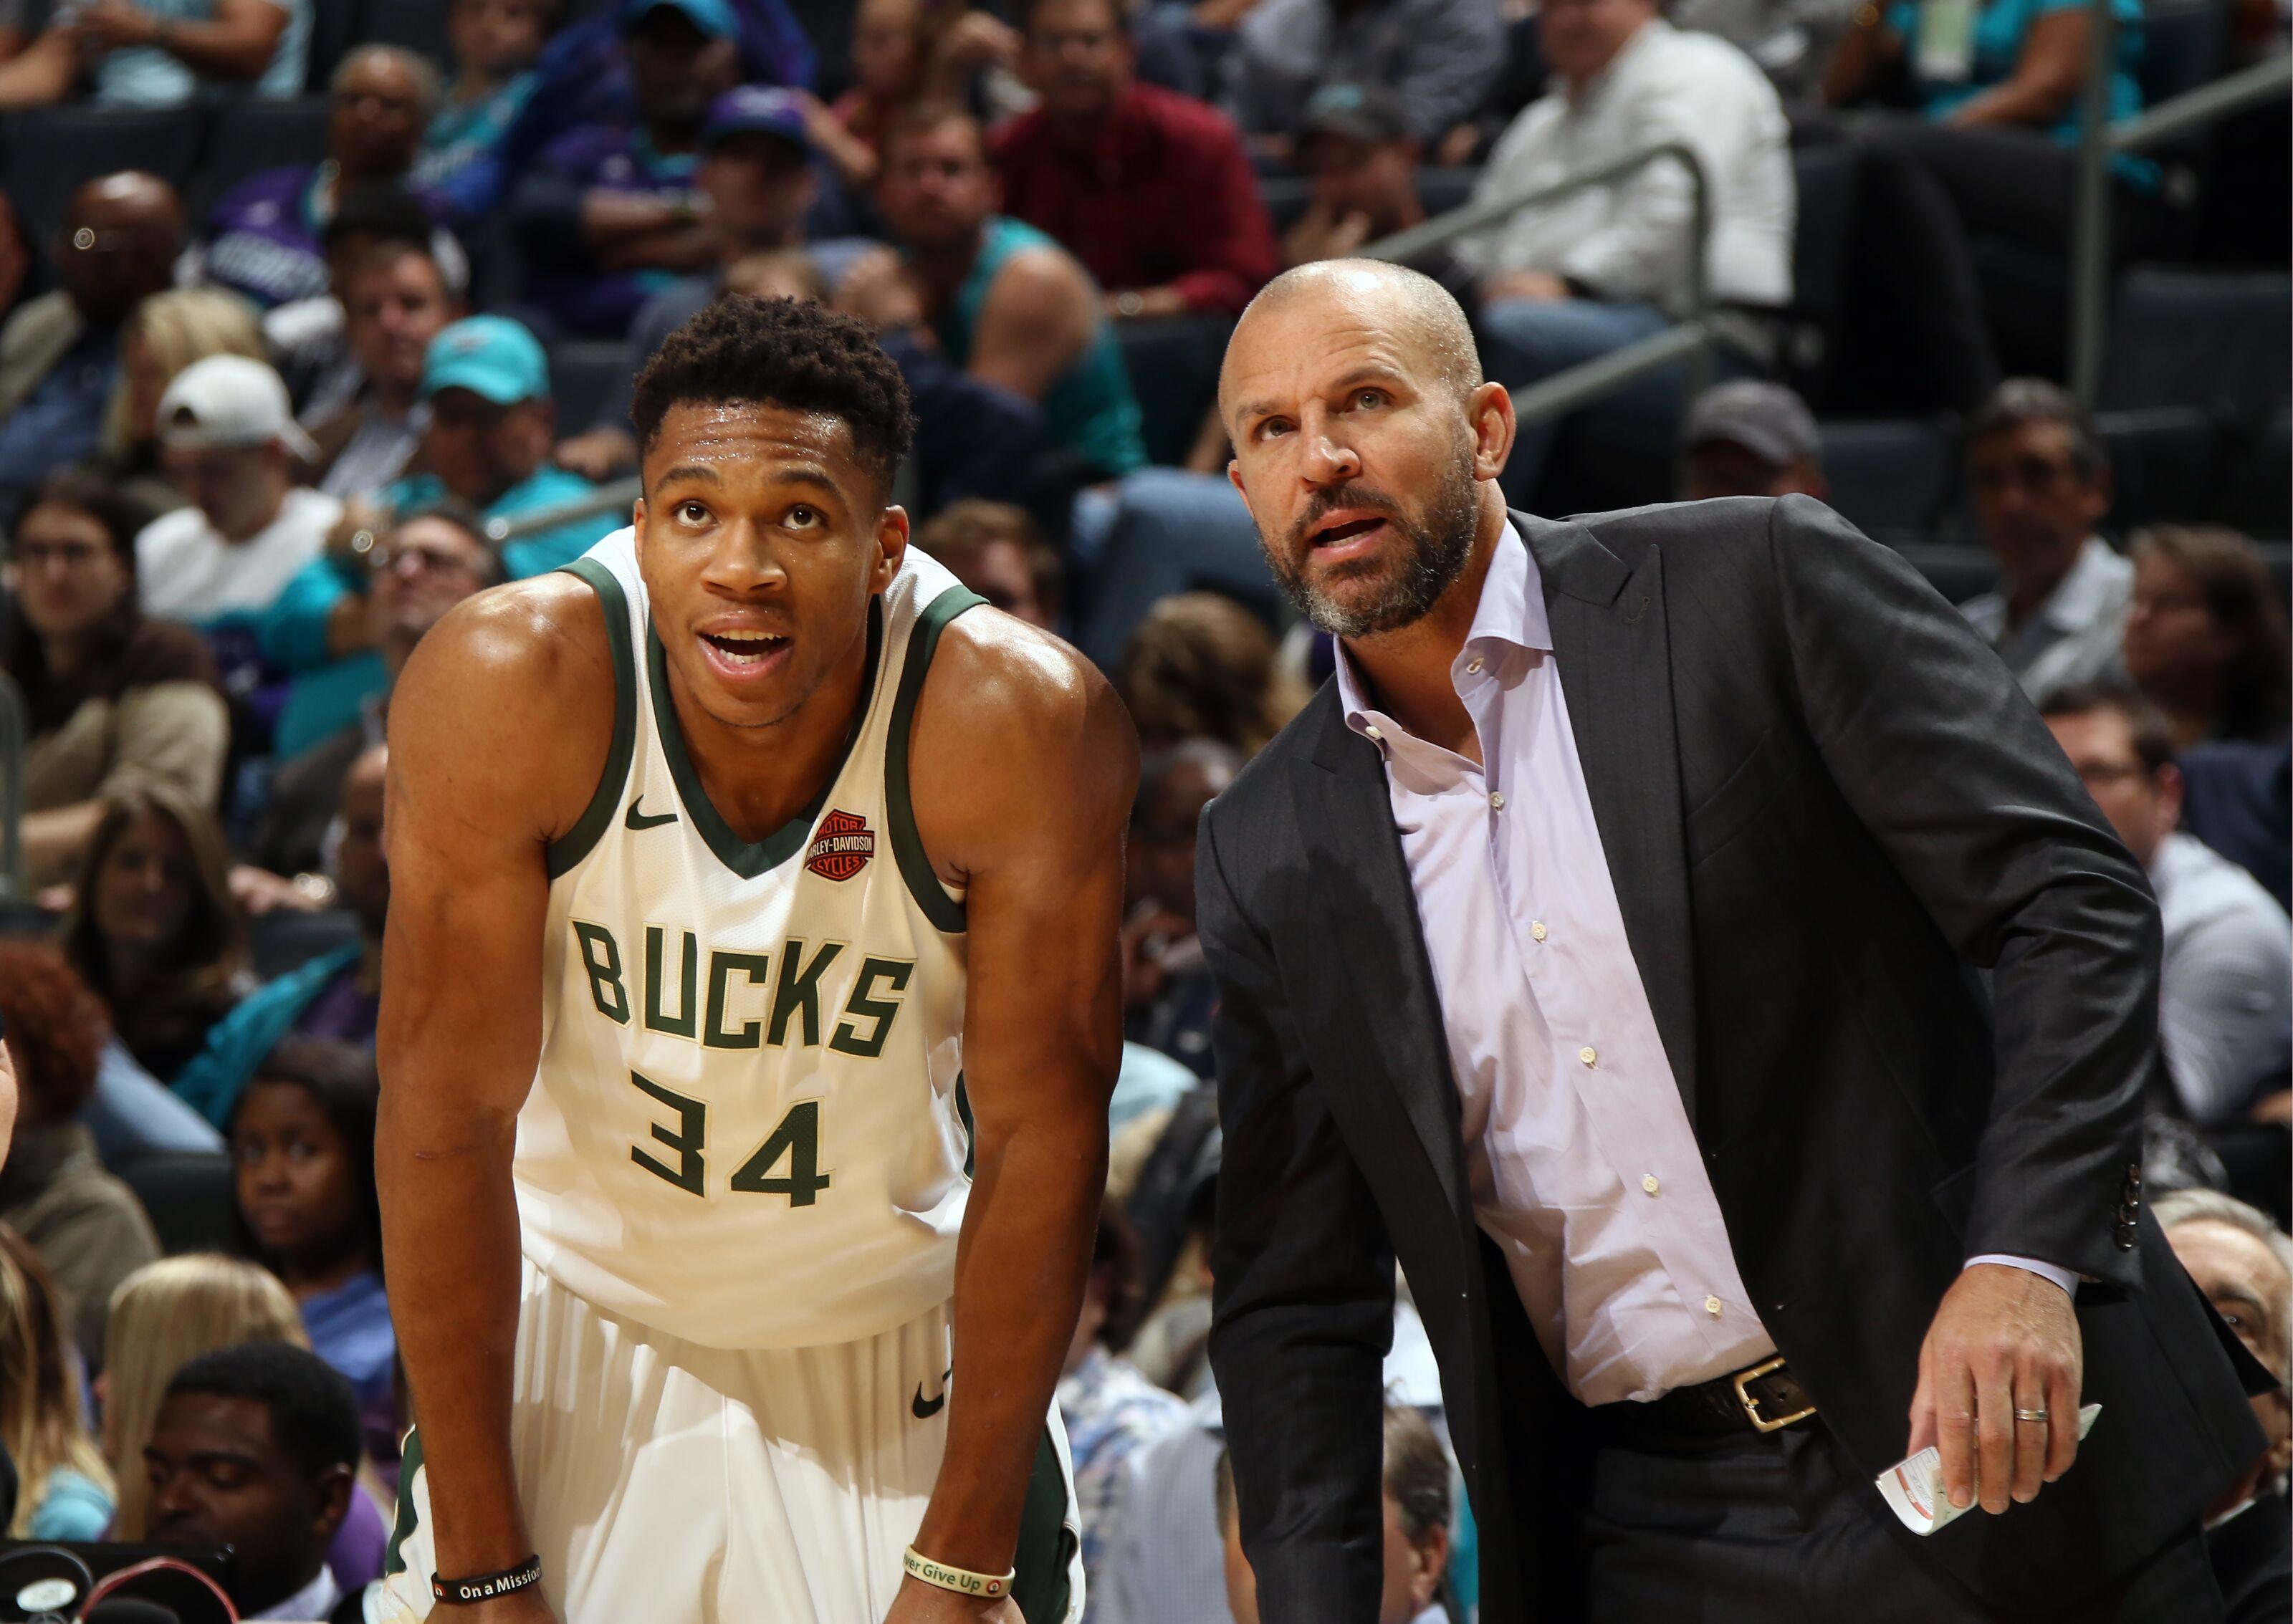 Lakers Rumors: Jason Kidd was hired to recruit Giannis Antetokounmpo